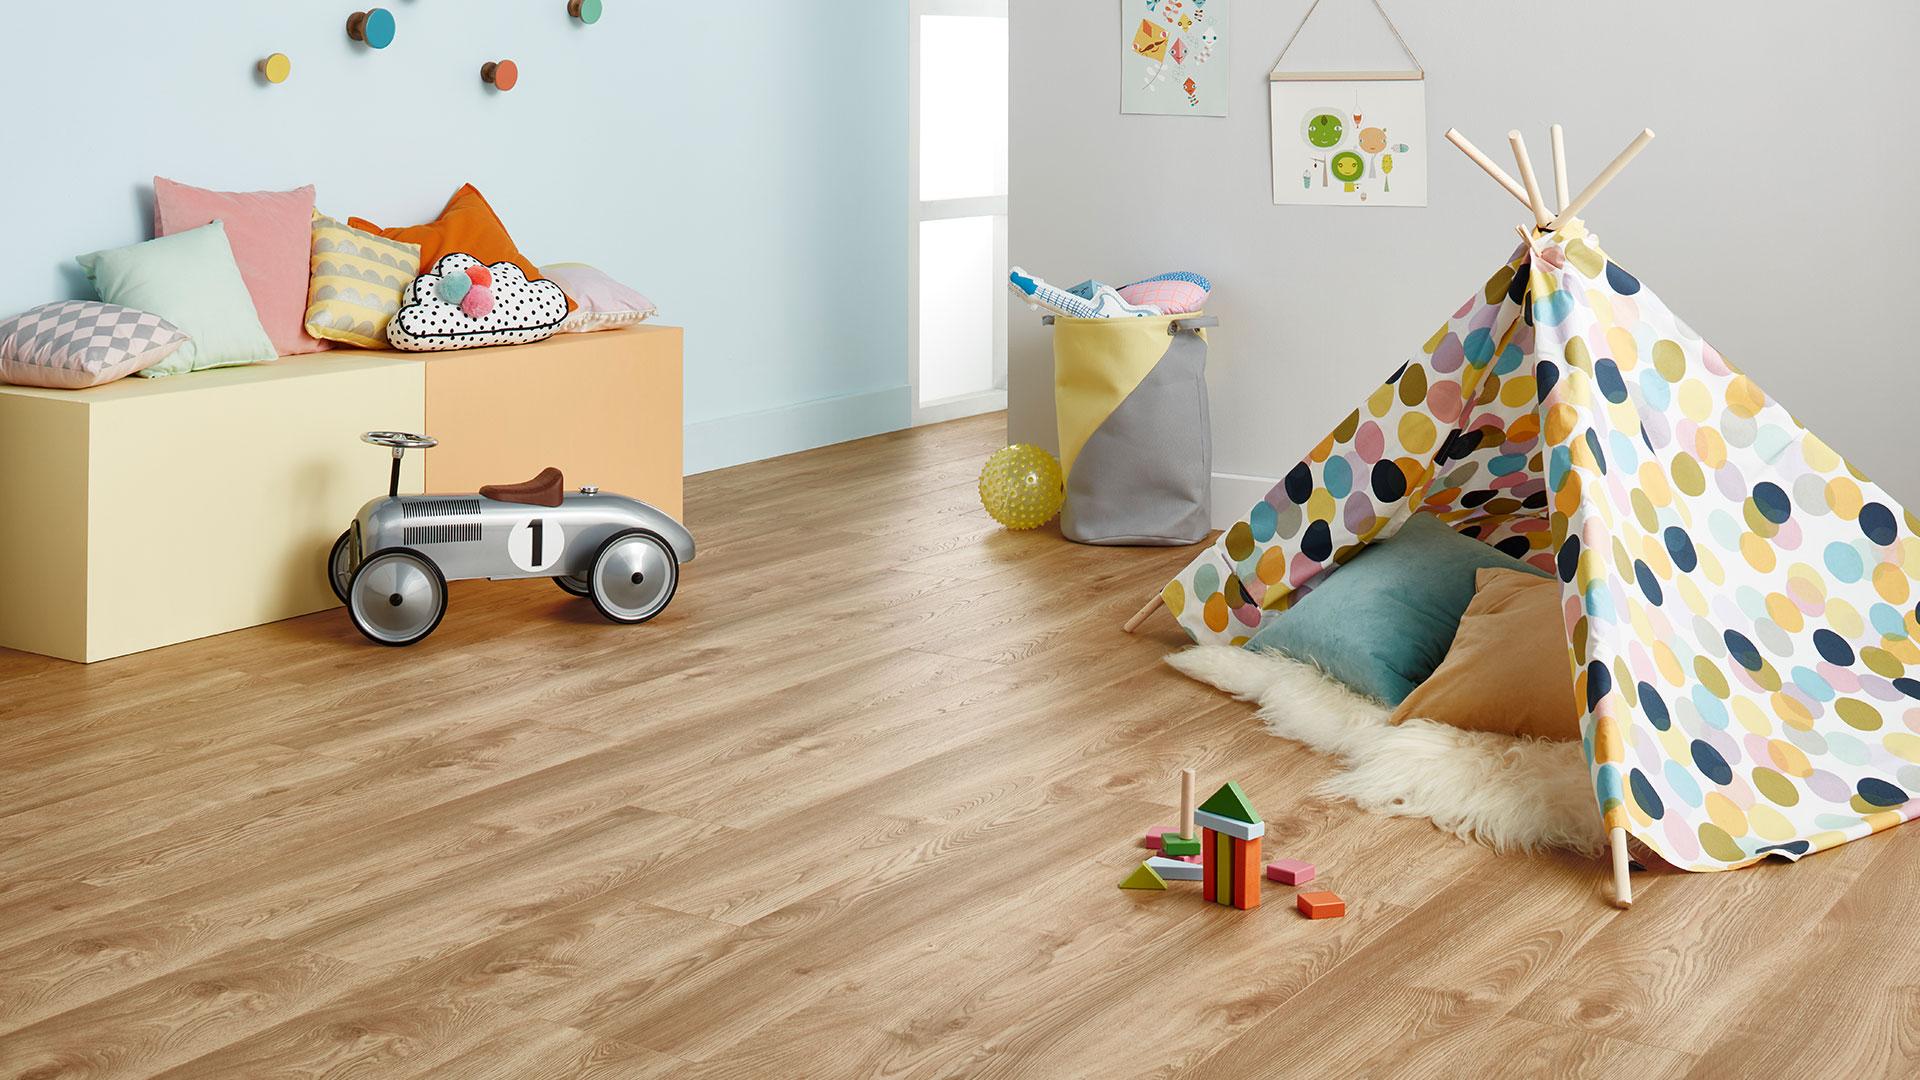 godfrey-hirst_flooring_slide05.jpg